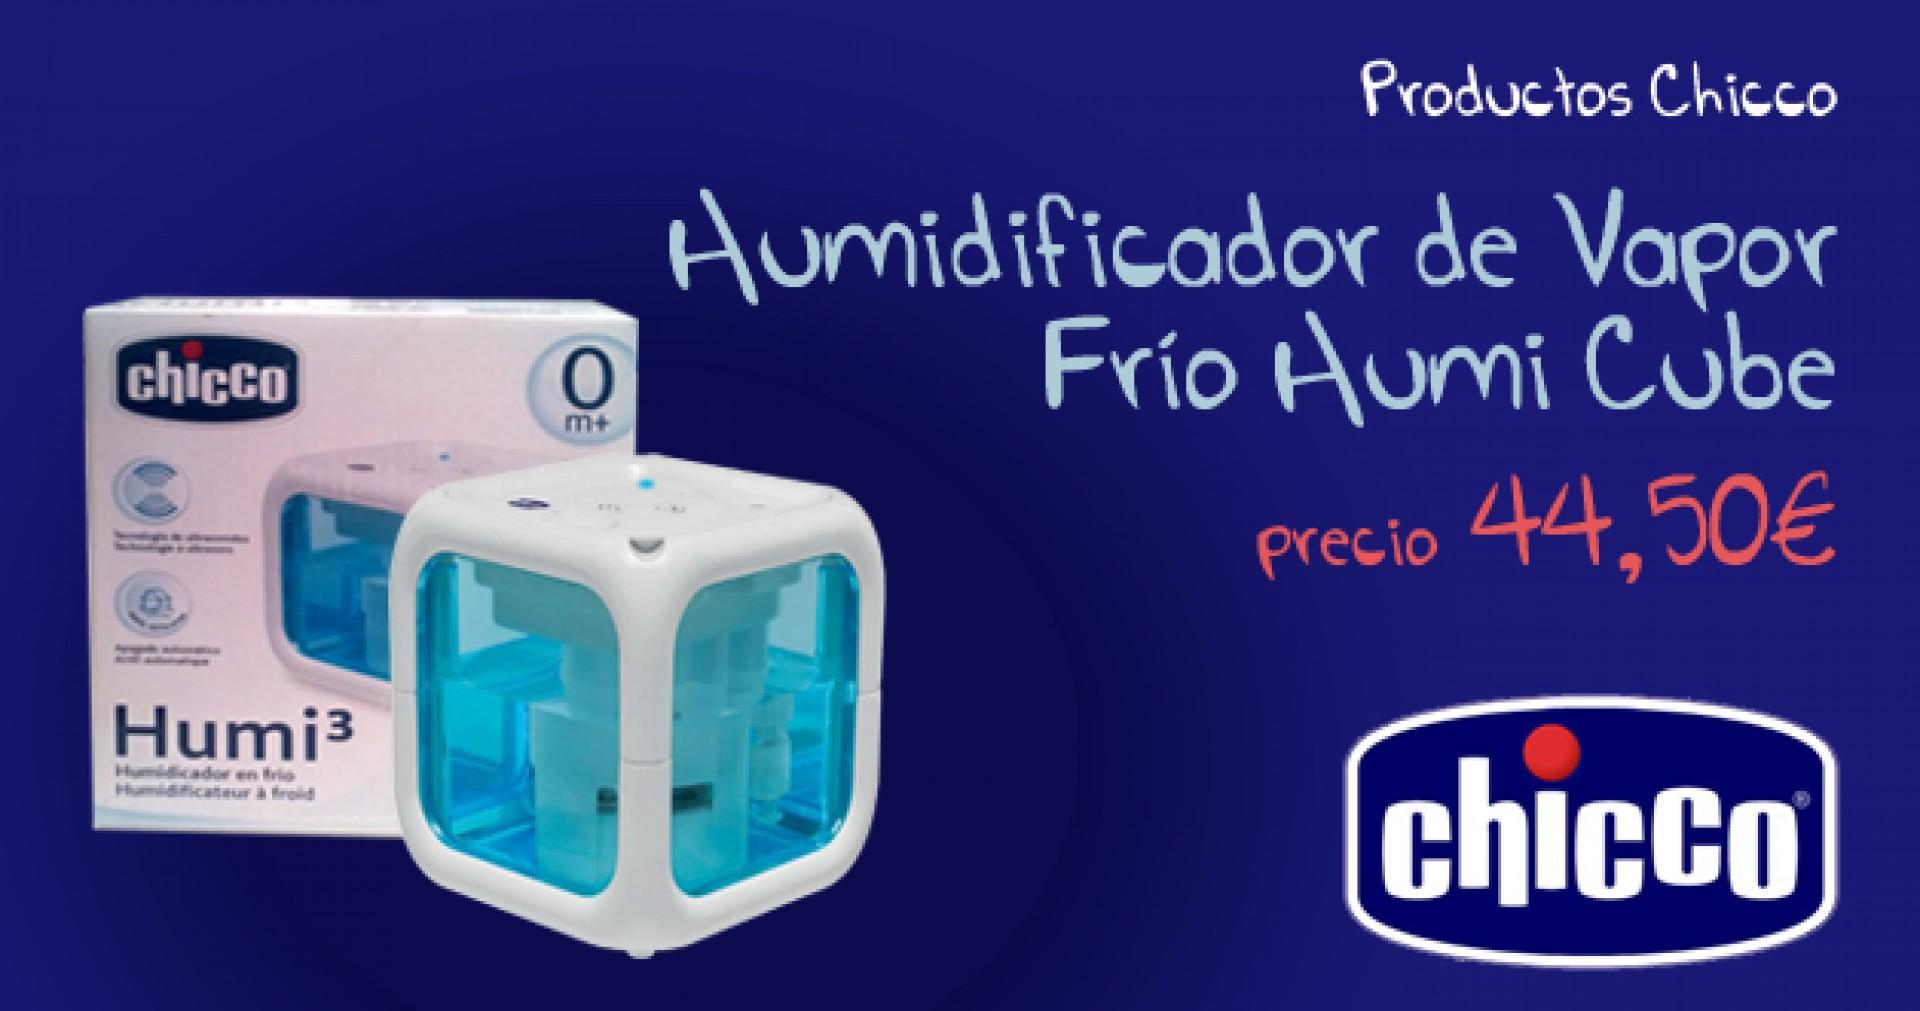 Humidificador de vapor frío Humi Cube chicco